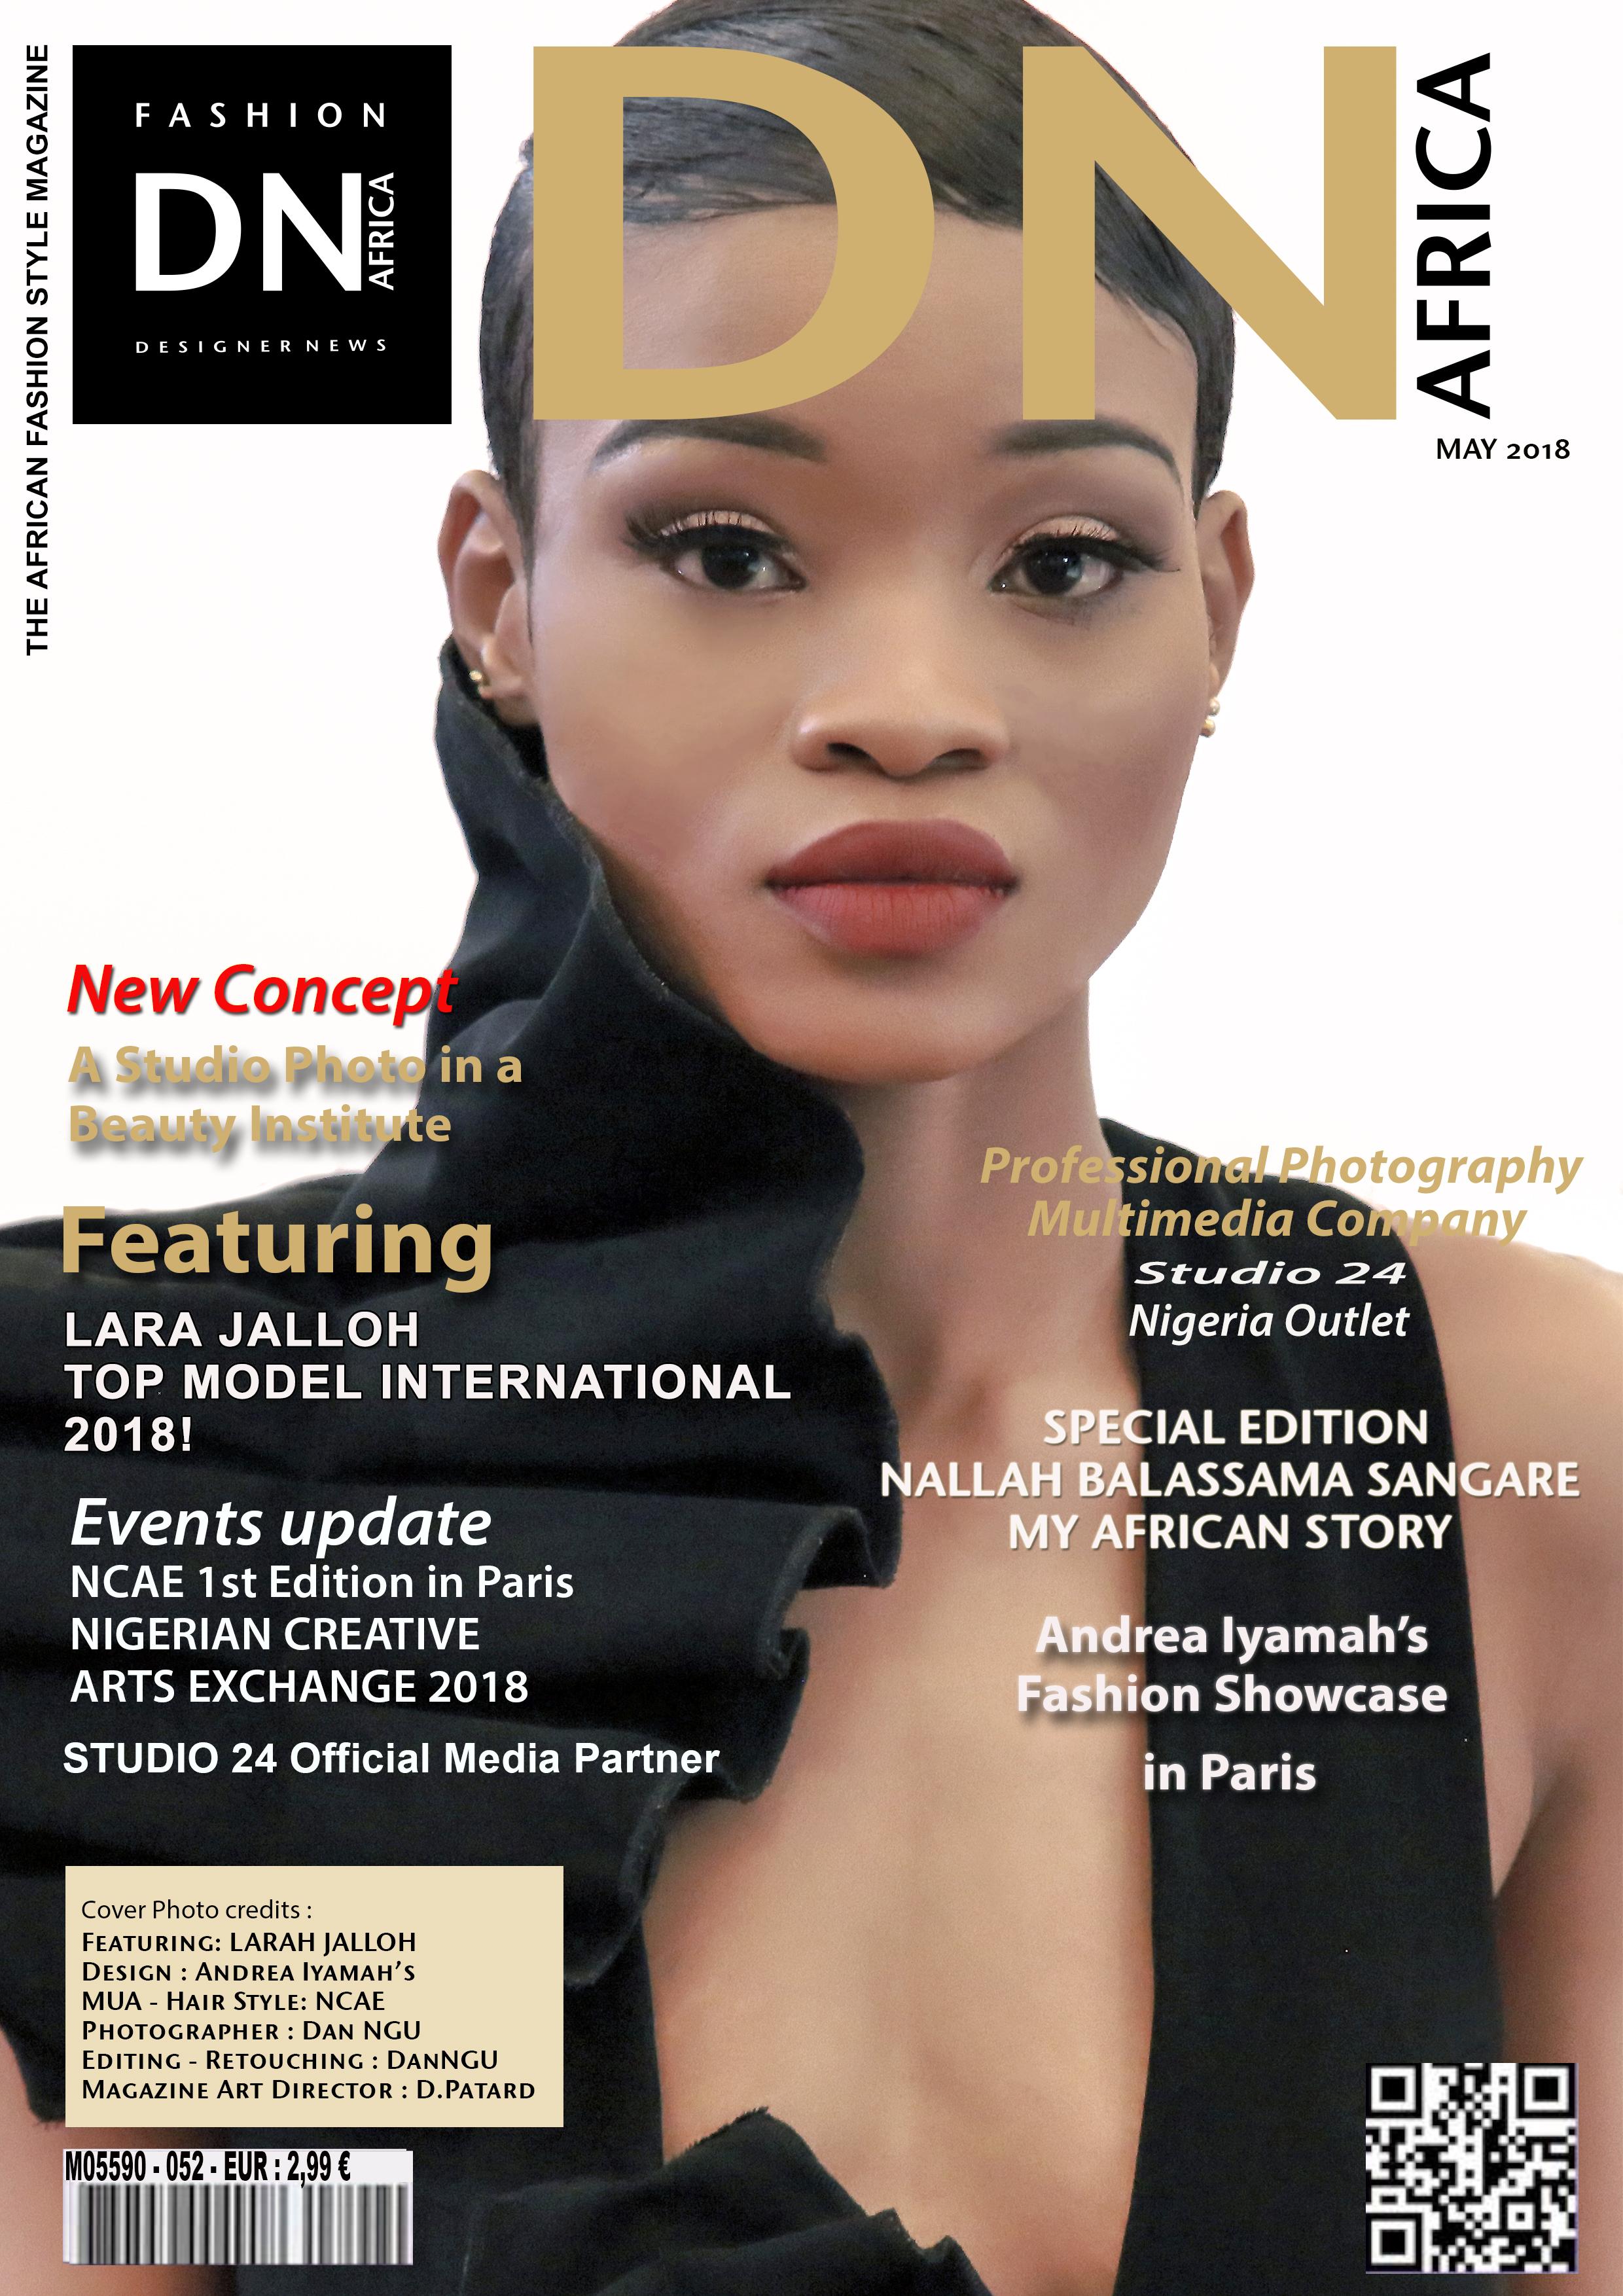 DNAFRICA-Cover-MAY 2018 Mag Number 52 Lara JALLOH - Designer Andrea Iyamah -  NIGERIAN CREATIVE ARTS EXCHANGE 2018 = NCAE - Media Partner DN MAG, DN AFRICA-STUDIO 24 NIGERIA - STUDIO 24 INTERNATIONAL - DN MAG - Indirâh Events & Communication